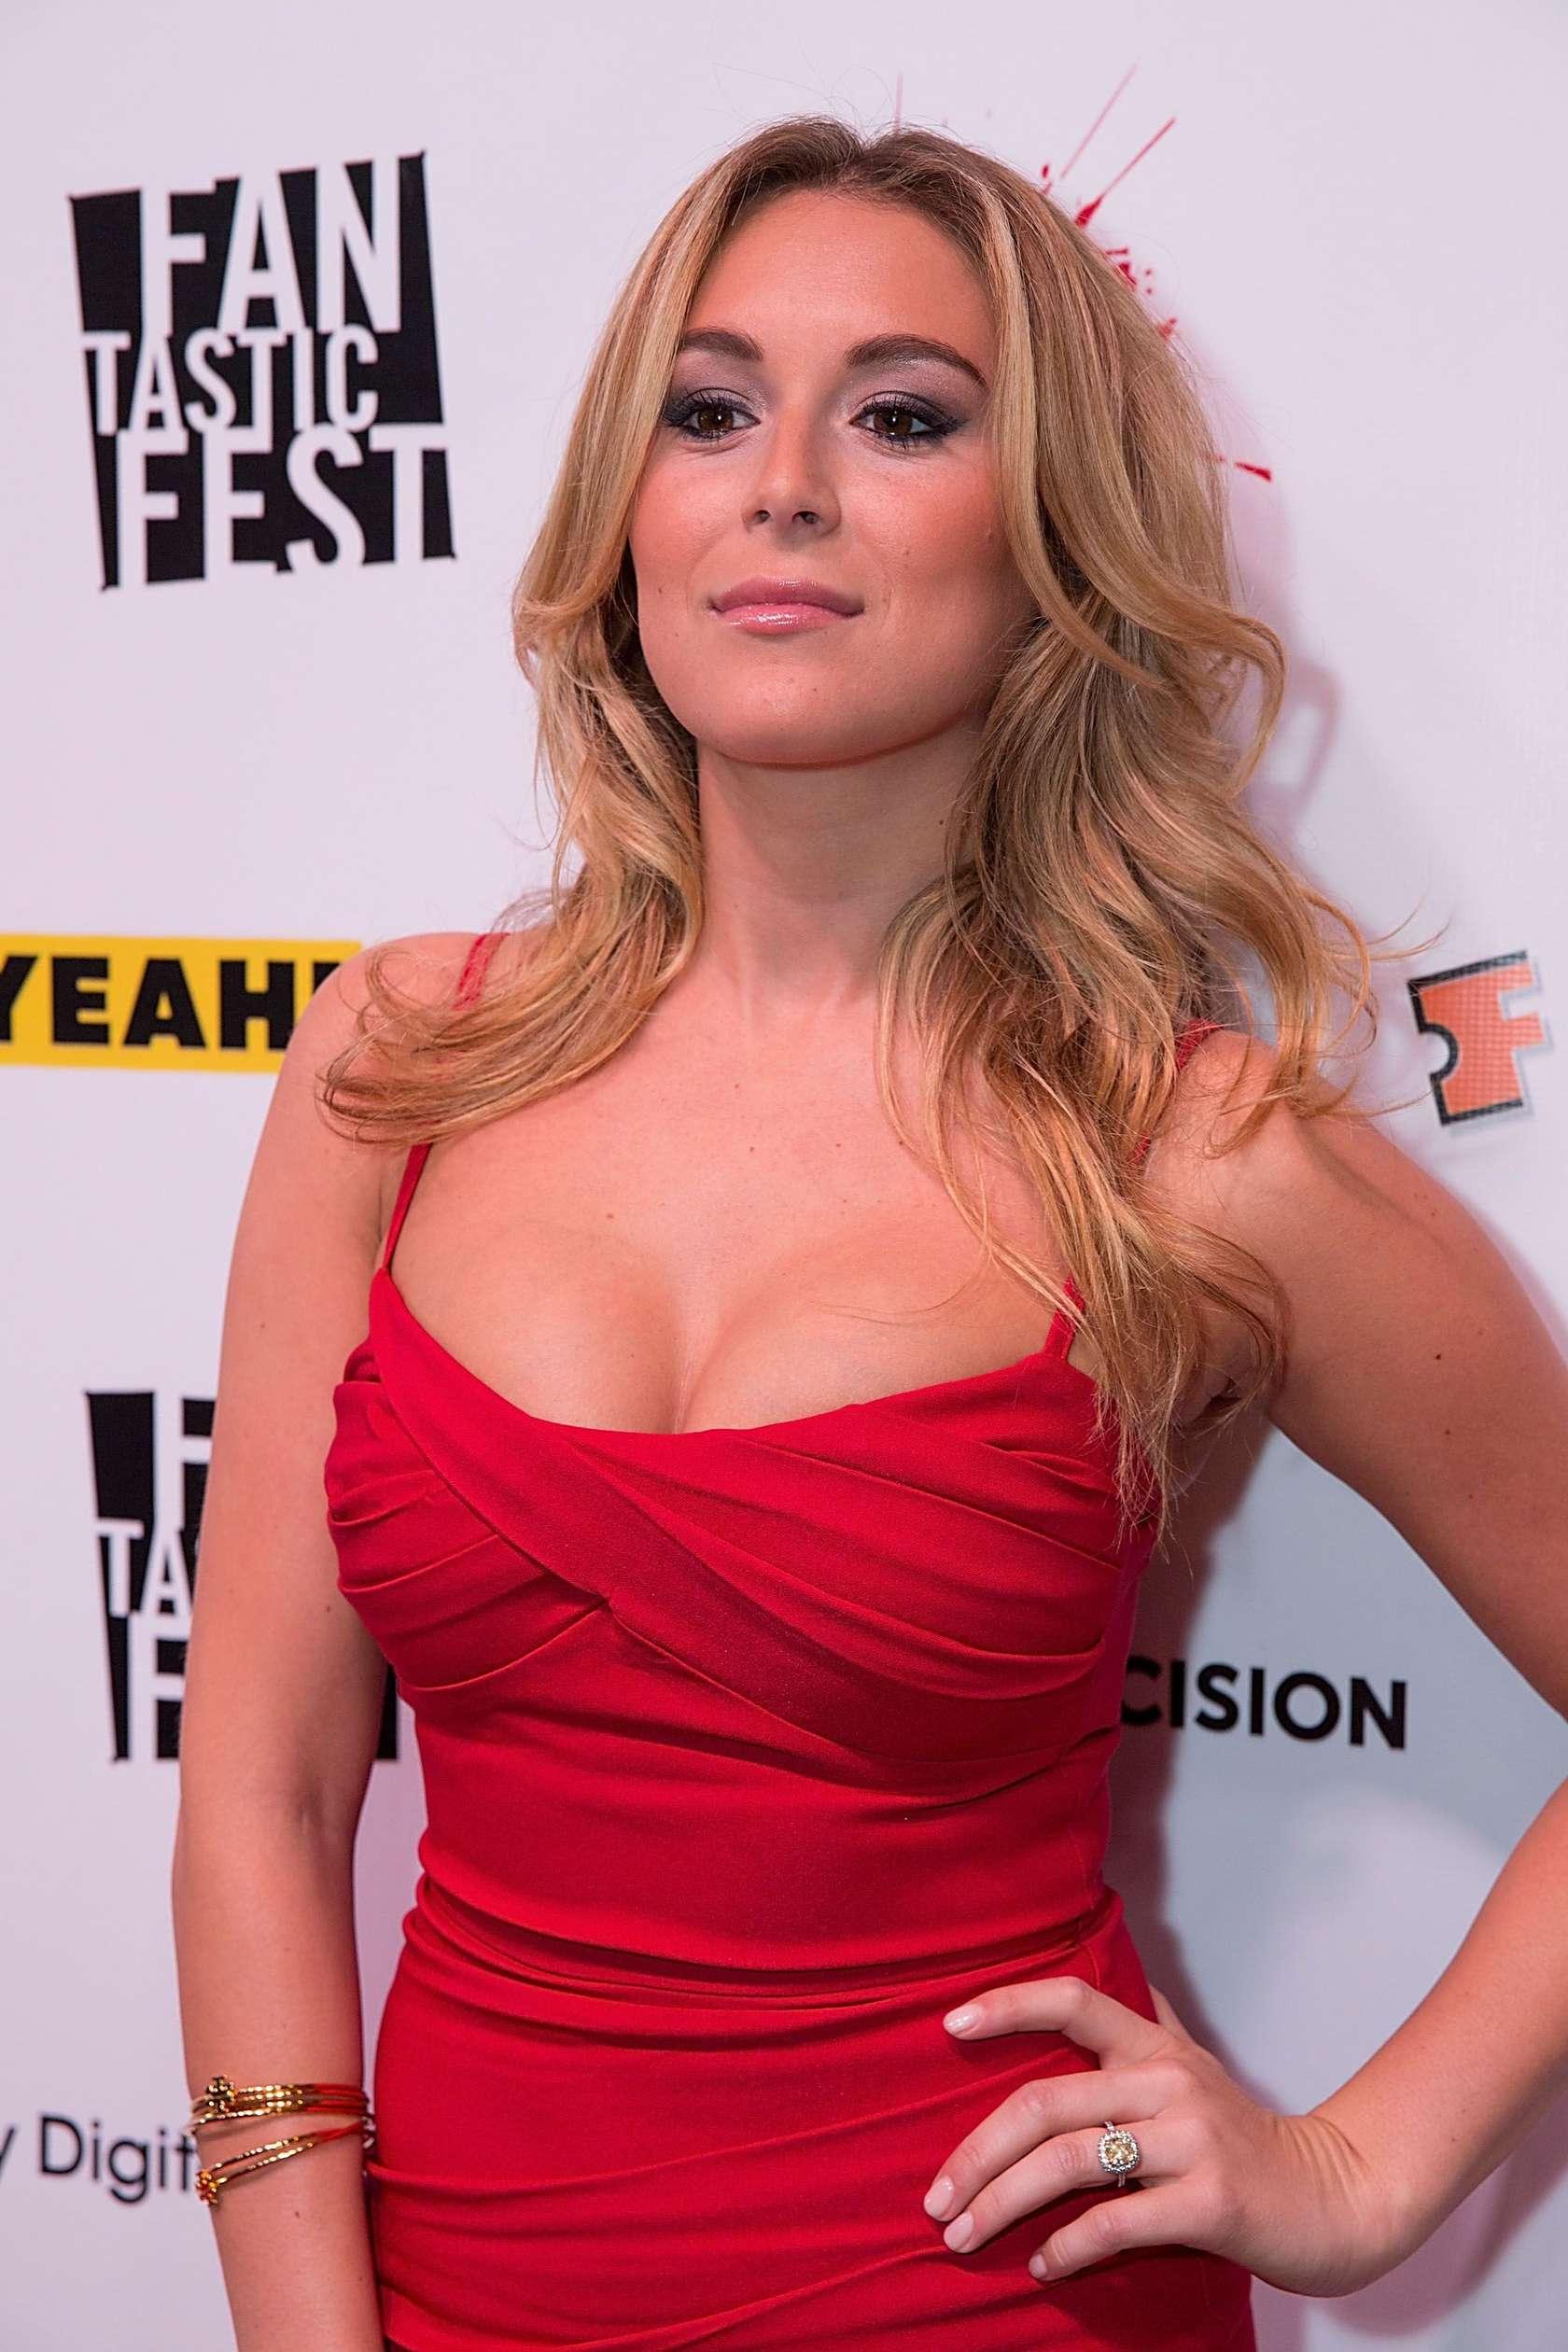 Alexa vega hot photos in red dress at 2013 machete kills premire in alexa vega machete kills premire in austin altavistaventures Gallery